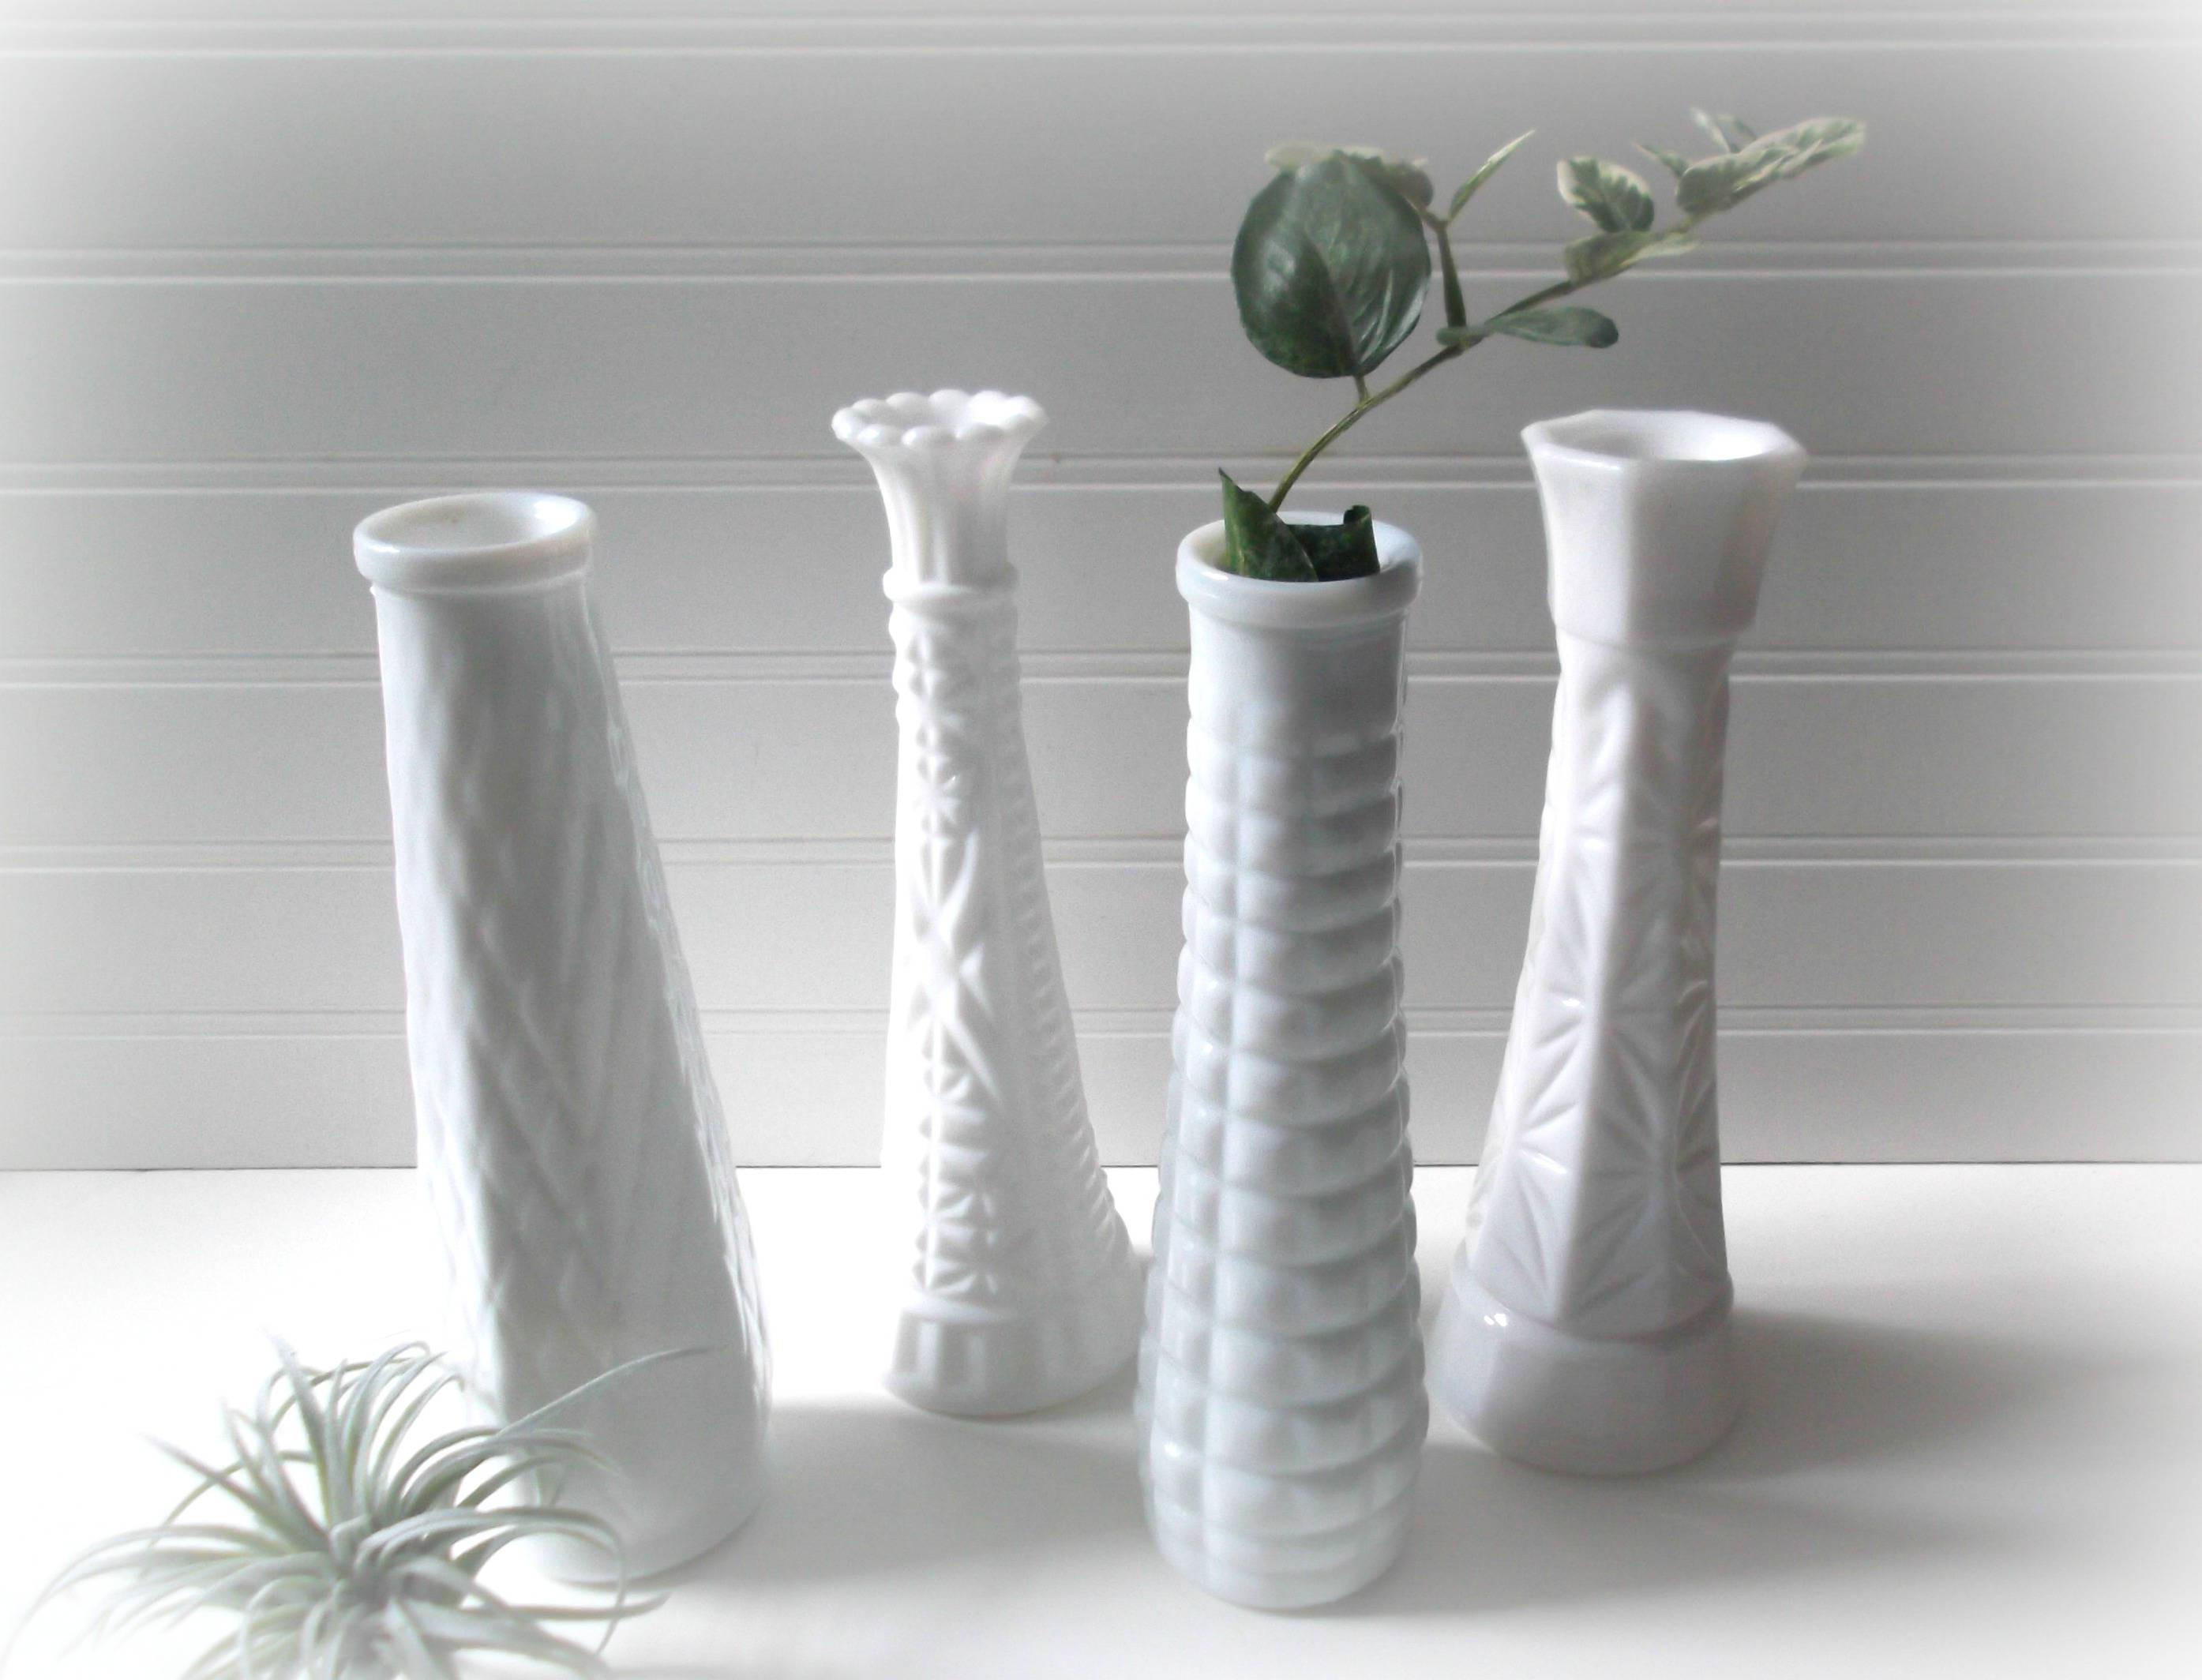 Anchor Hocking Bud Vase Of Milk Glass Bud Vases Set Of 4 Vases for Wedding Vintage Etsy Inside Image 0